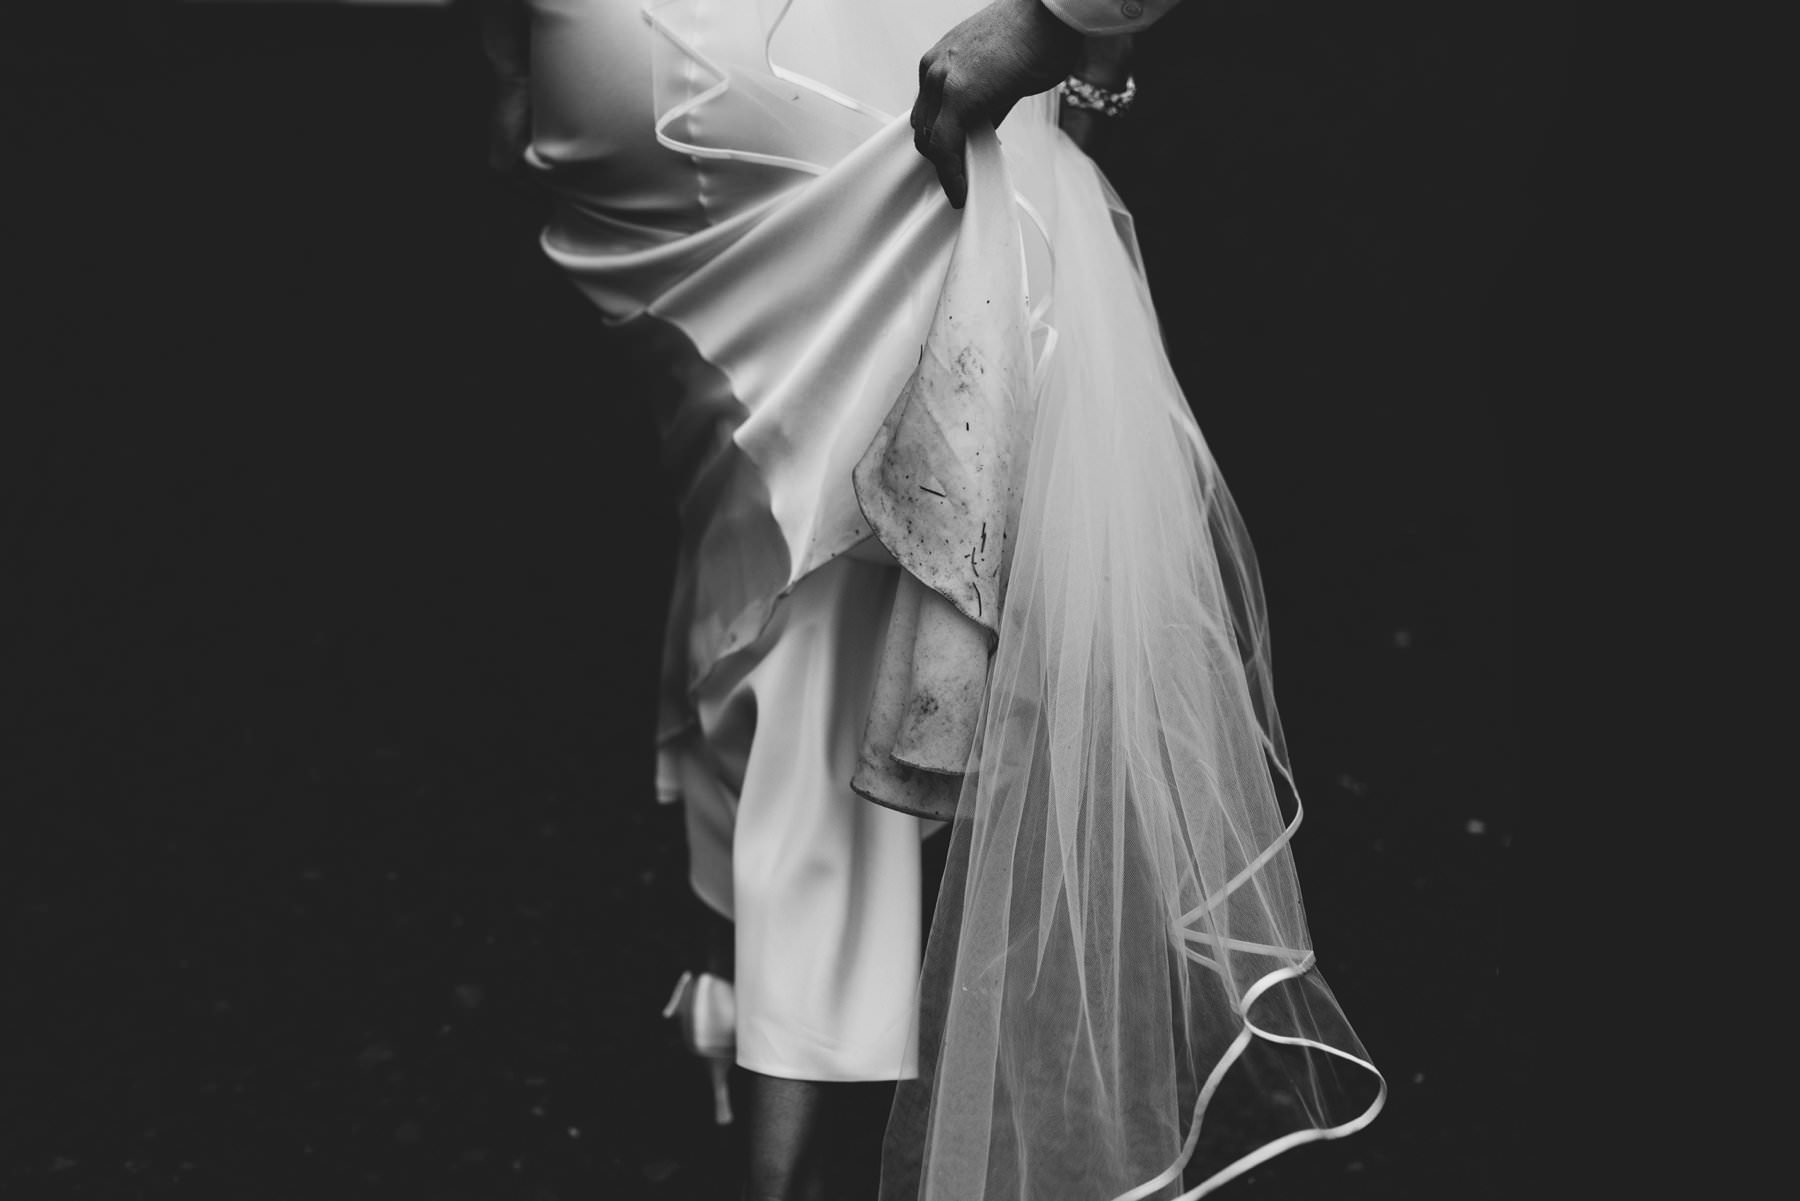 a brides dirty wedding dress wedding photography northern ireland